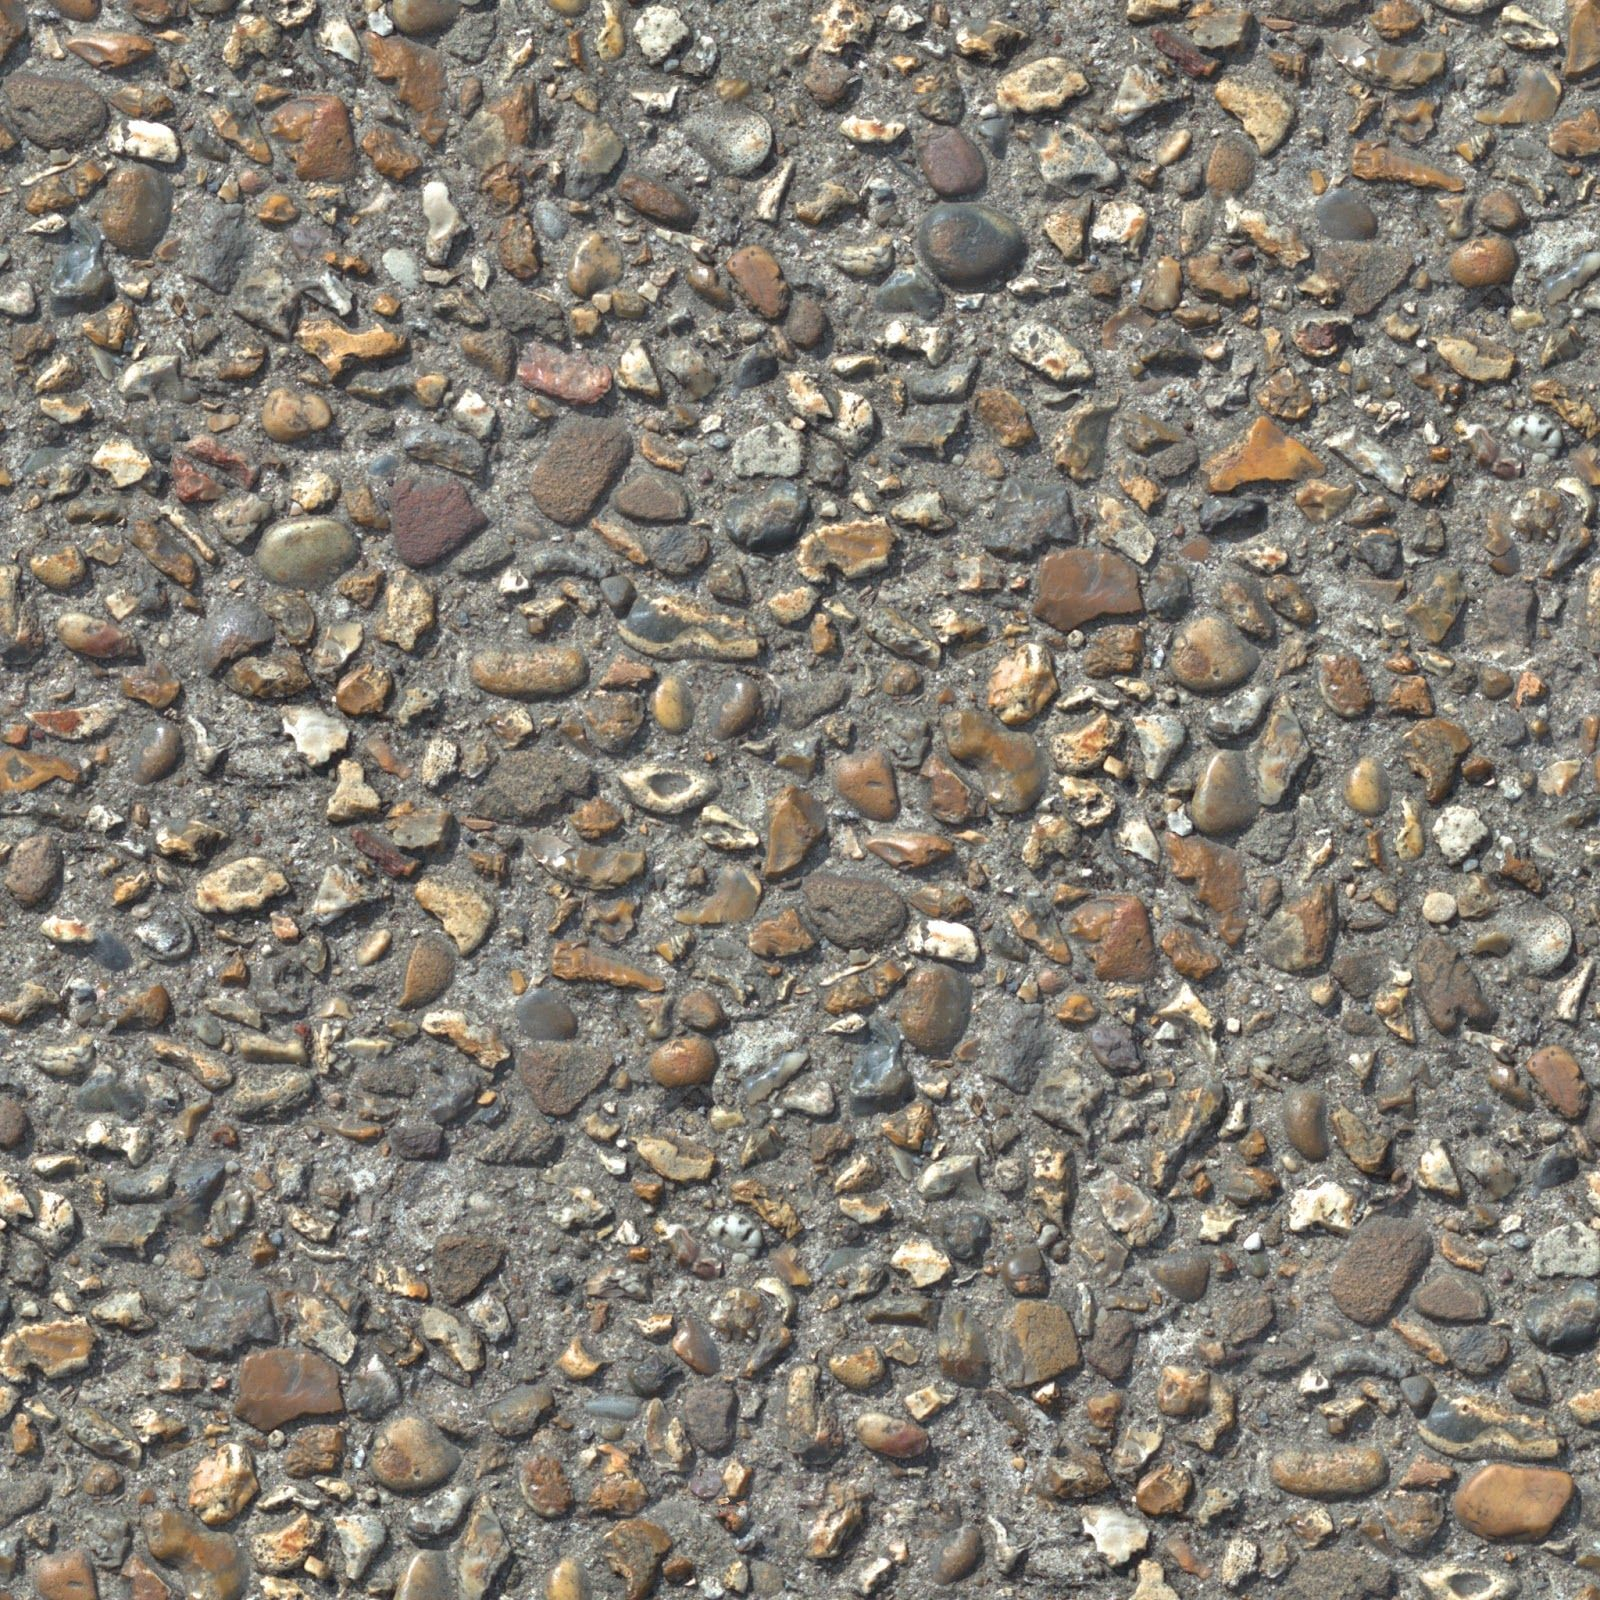 Textures architecture roads roads dirt road texture seamless -  Concrete Cobble Stone 3 Pebble Walkway Seamless Texture 2048x2048